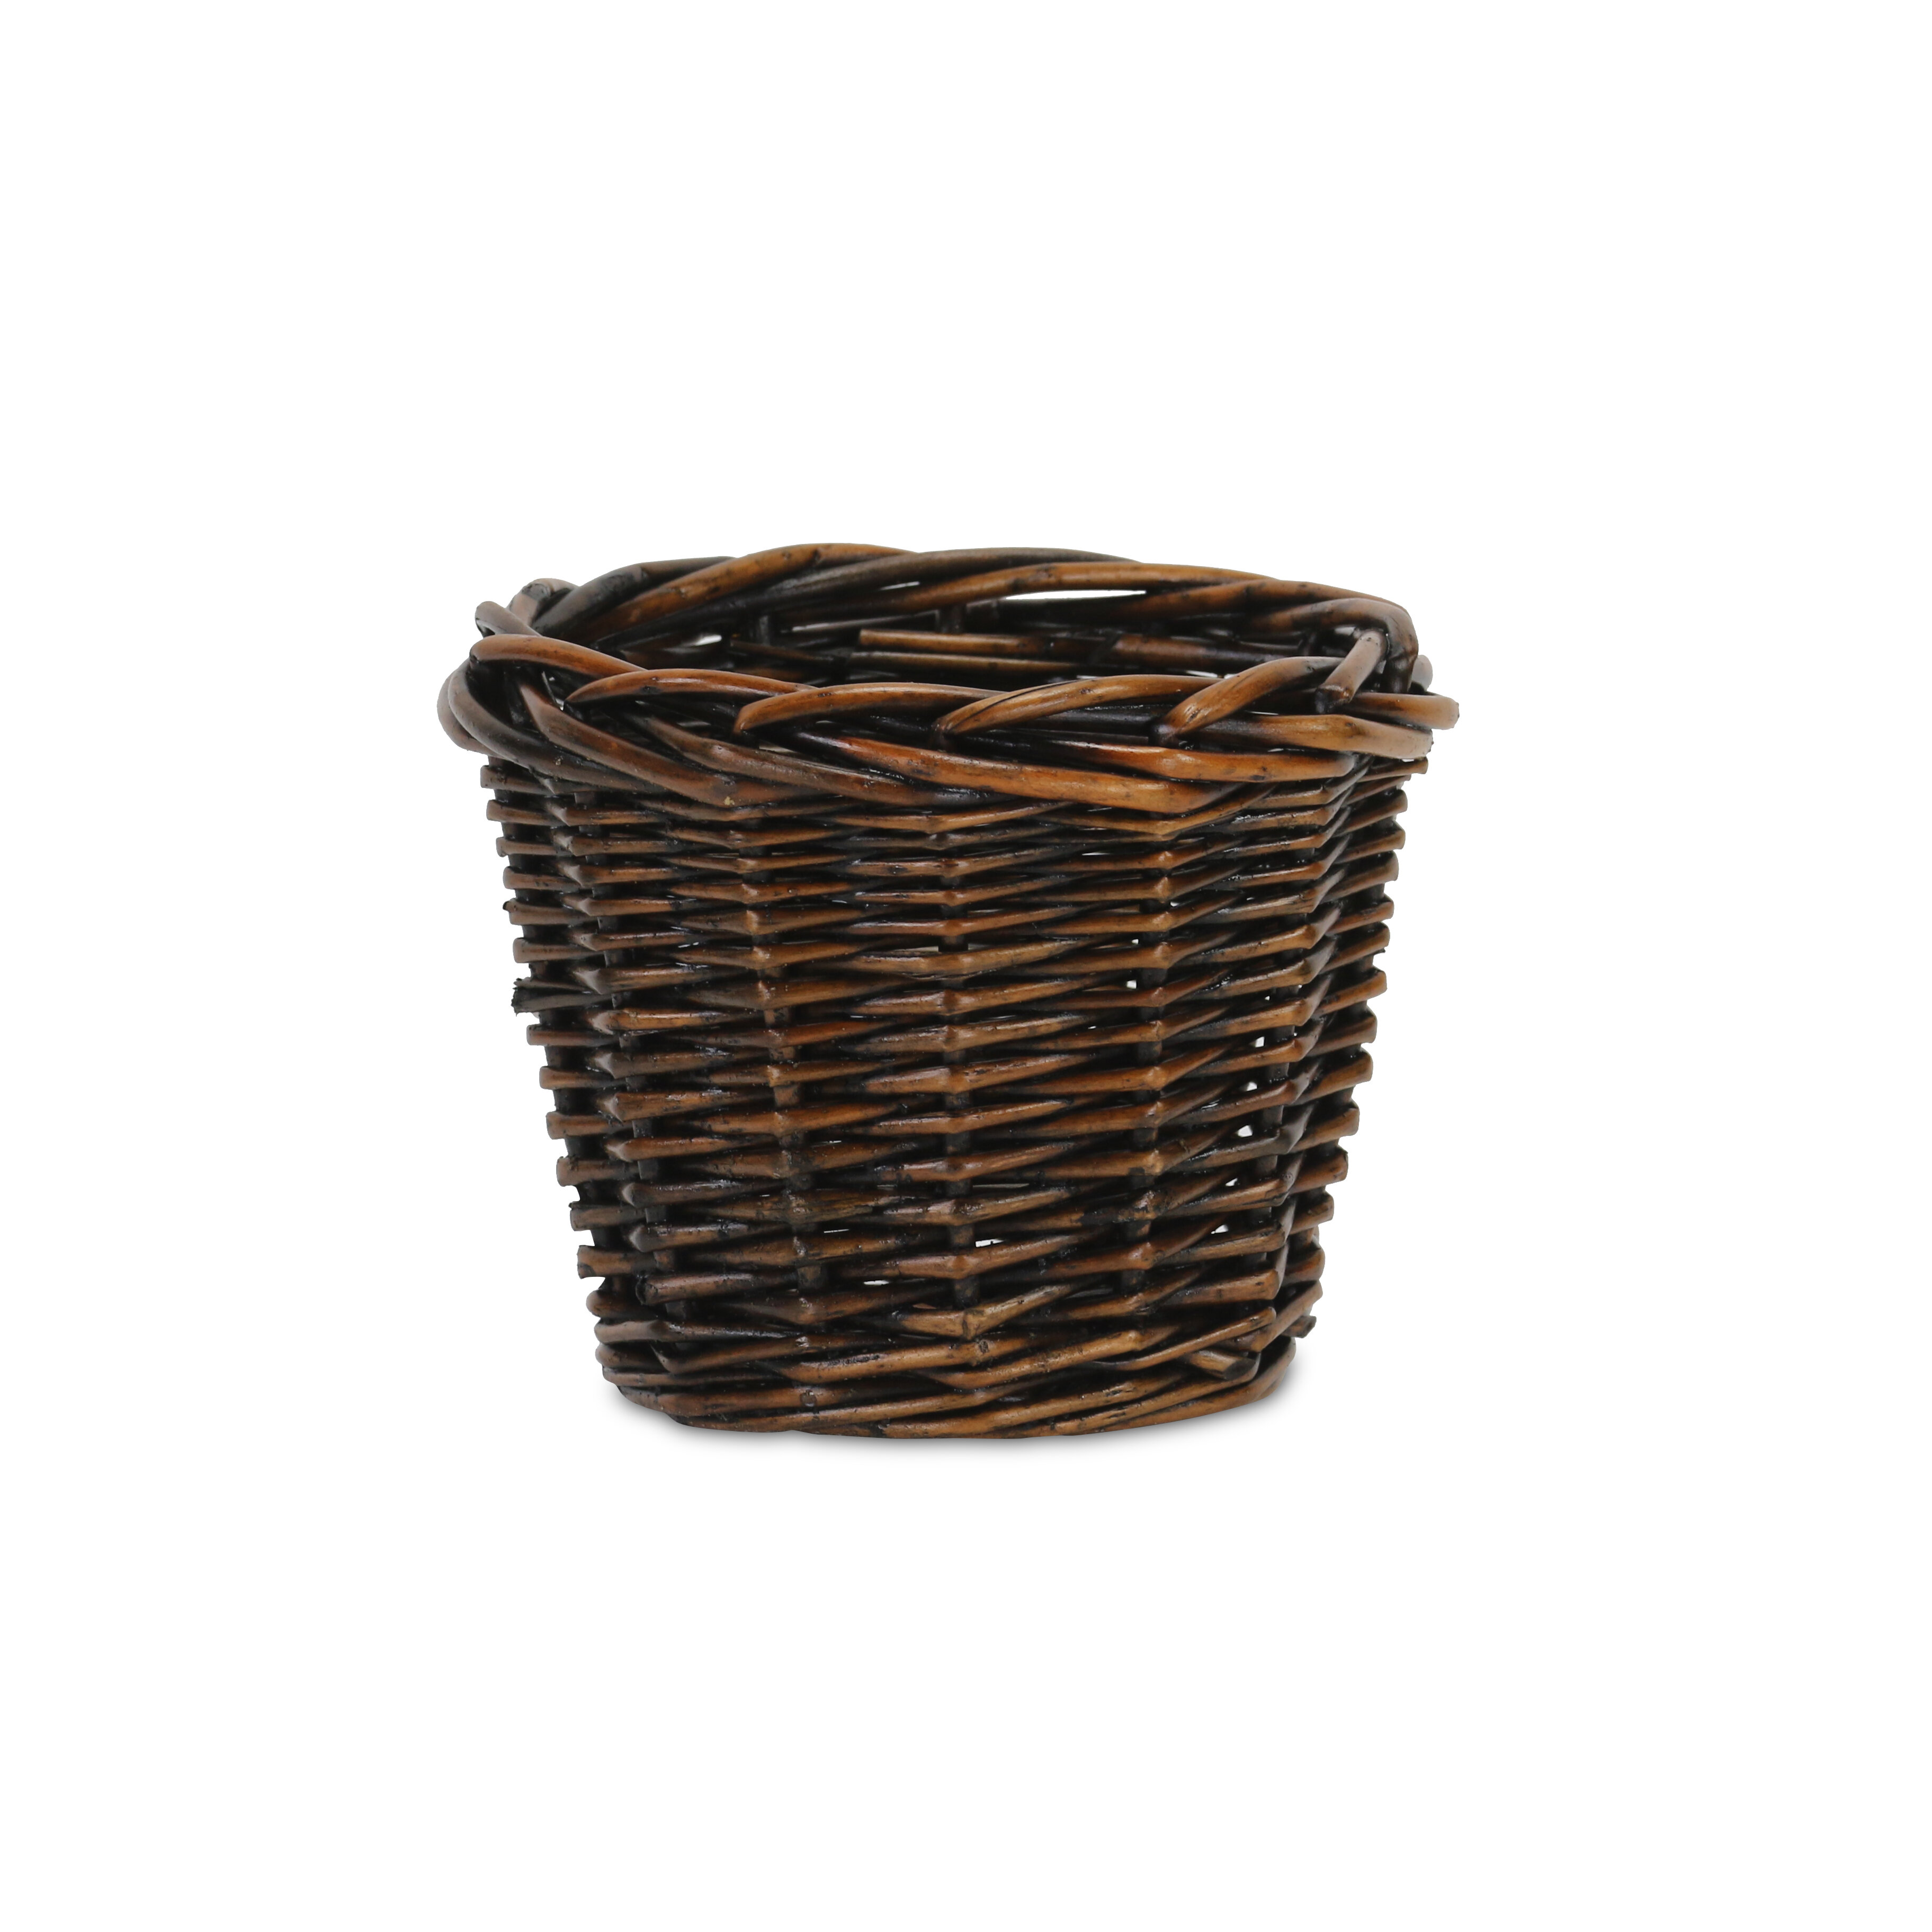 Bay Isle Home Compact Wicker Basket Wayfair